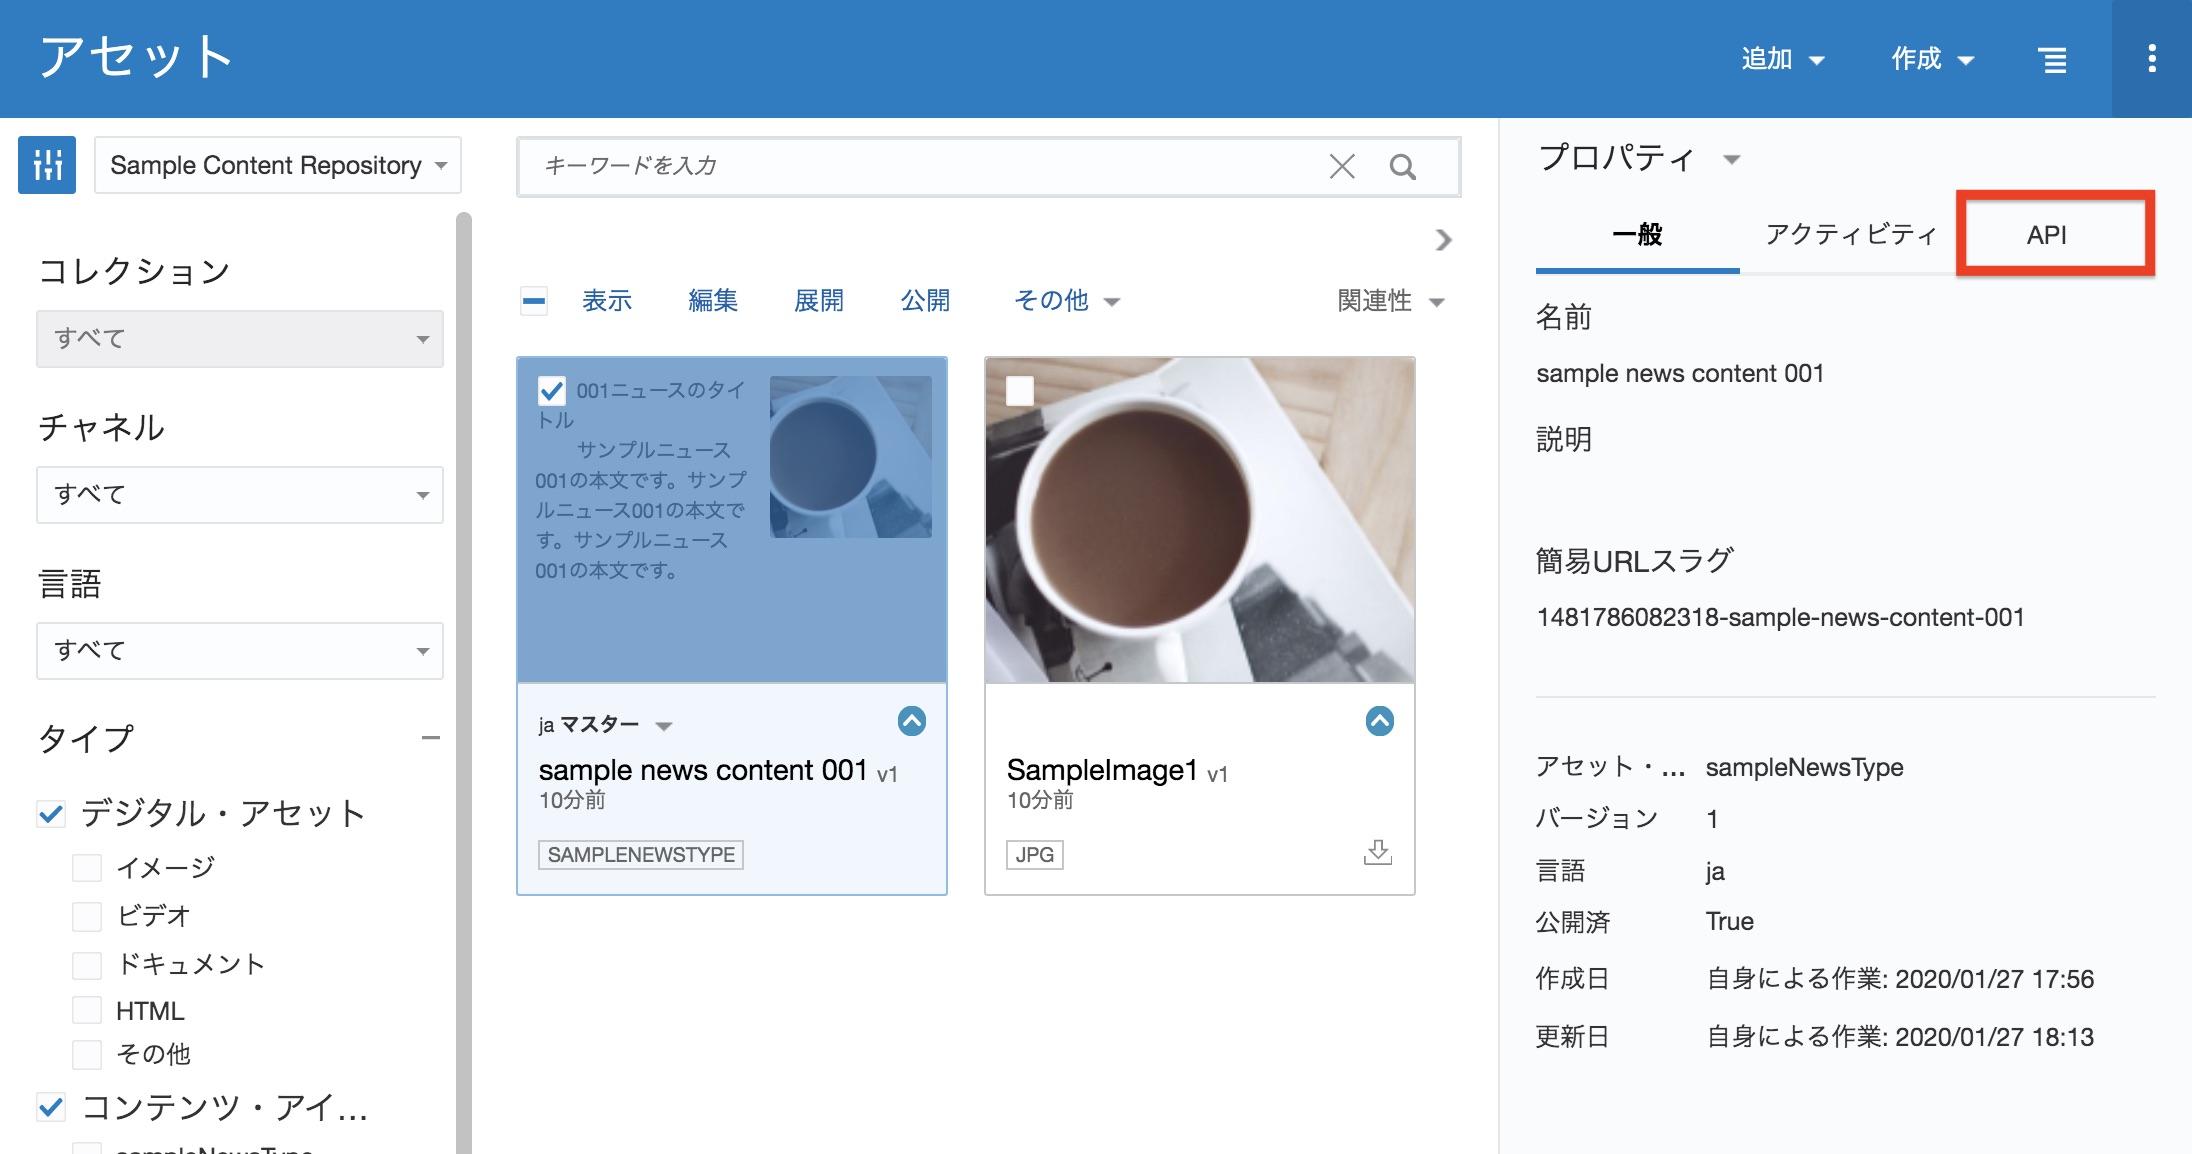 image_oce43.jpg